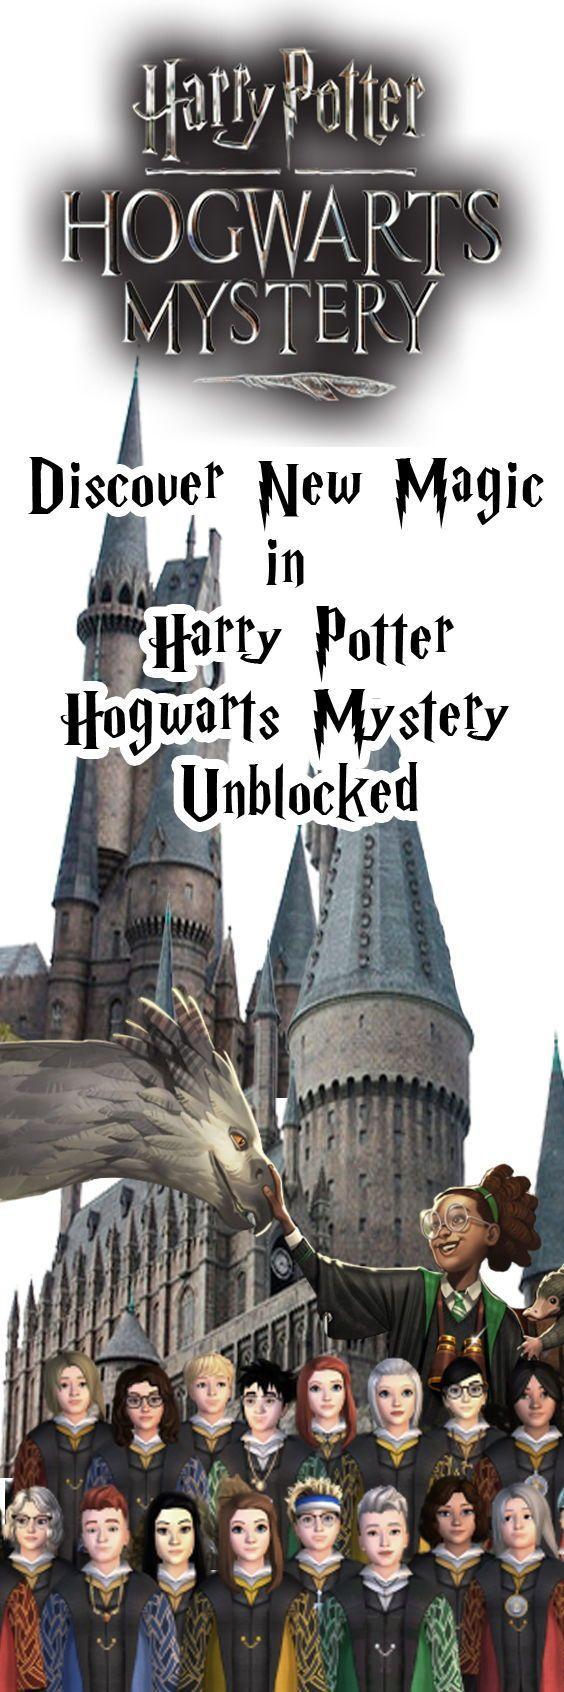 New Magic In Harry Potter Hogwarts Mystery Unblocked Hogwarts Mystery Harry Potter Magic Hogwarts